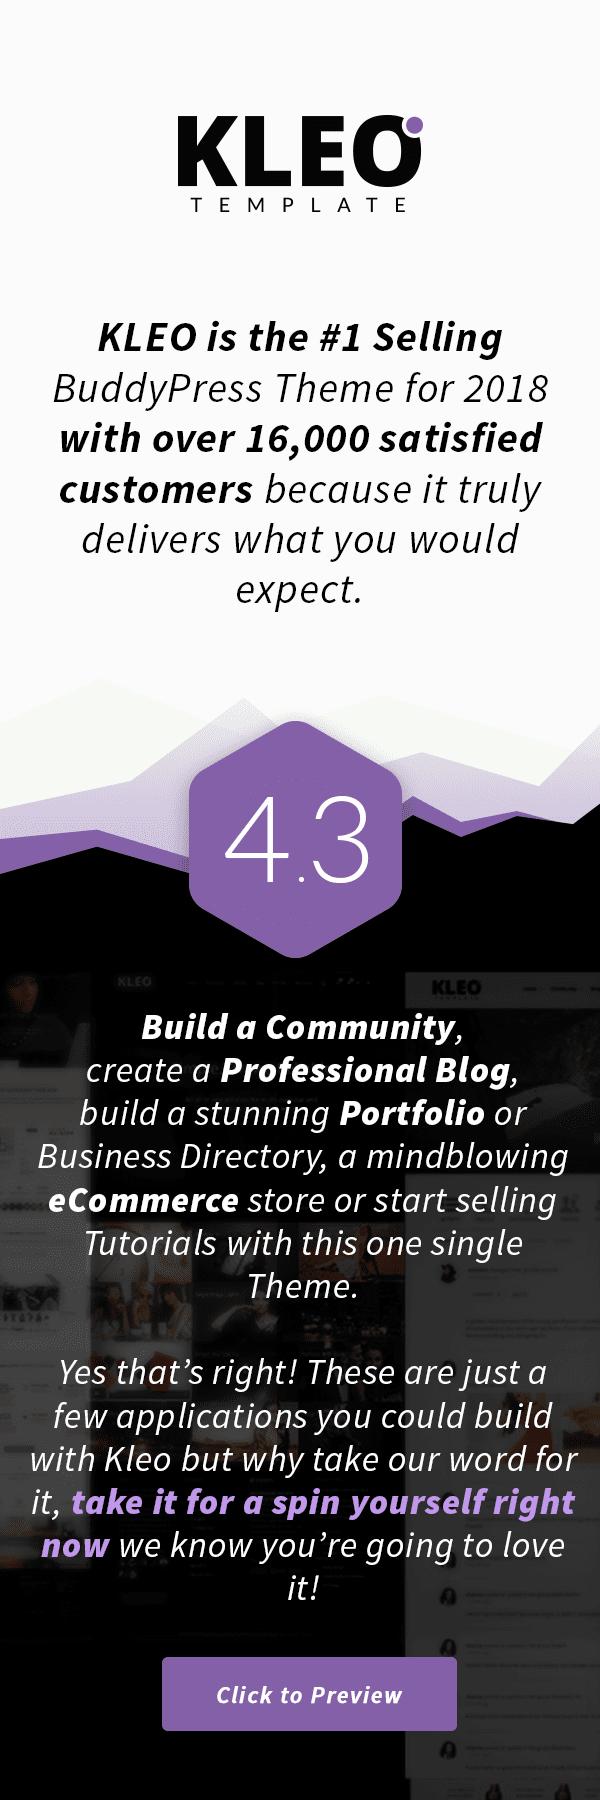 kleo3 - KLEO - Pro Community Focused, Multi-Purpose BuddyPress Theme